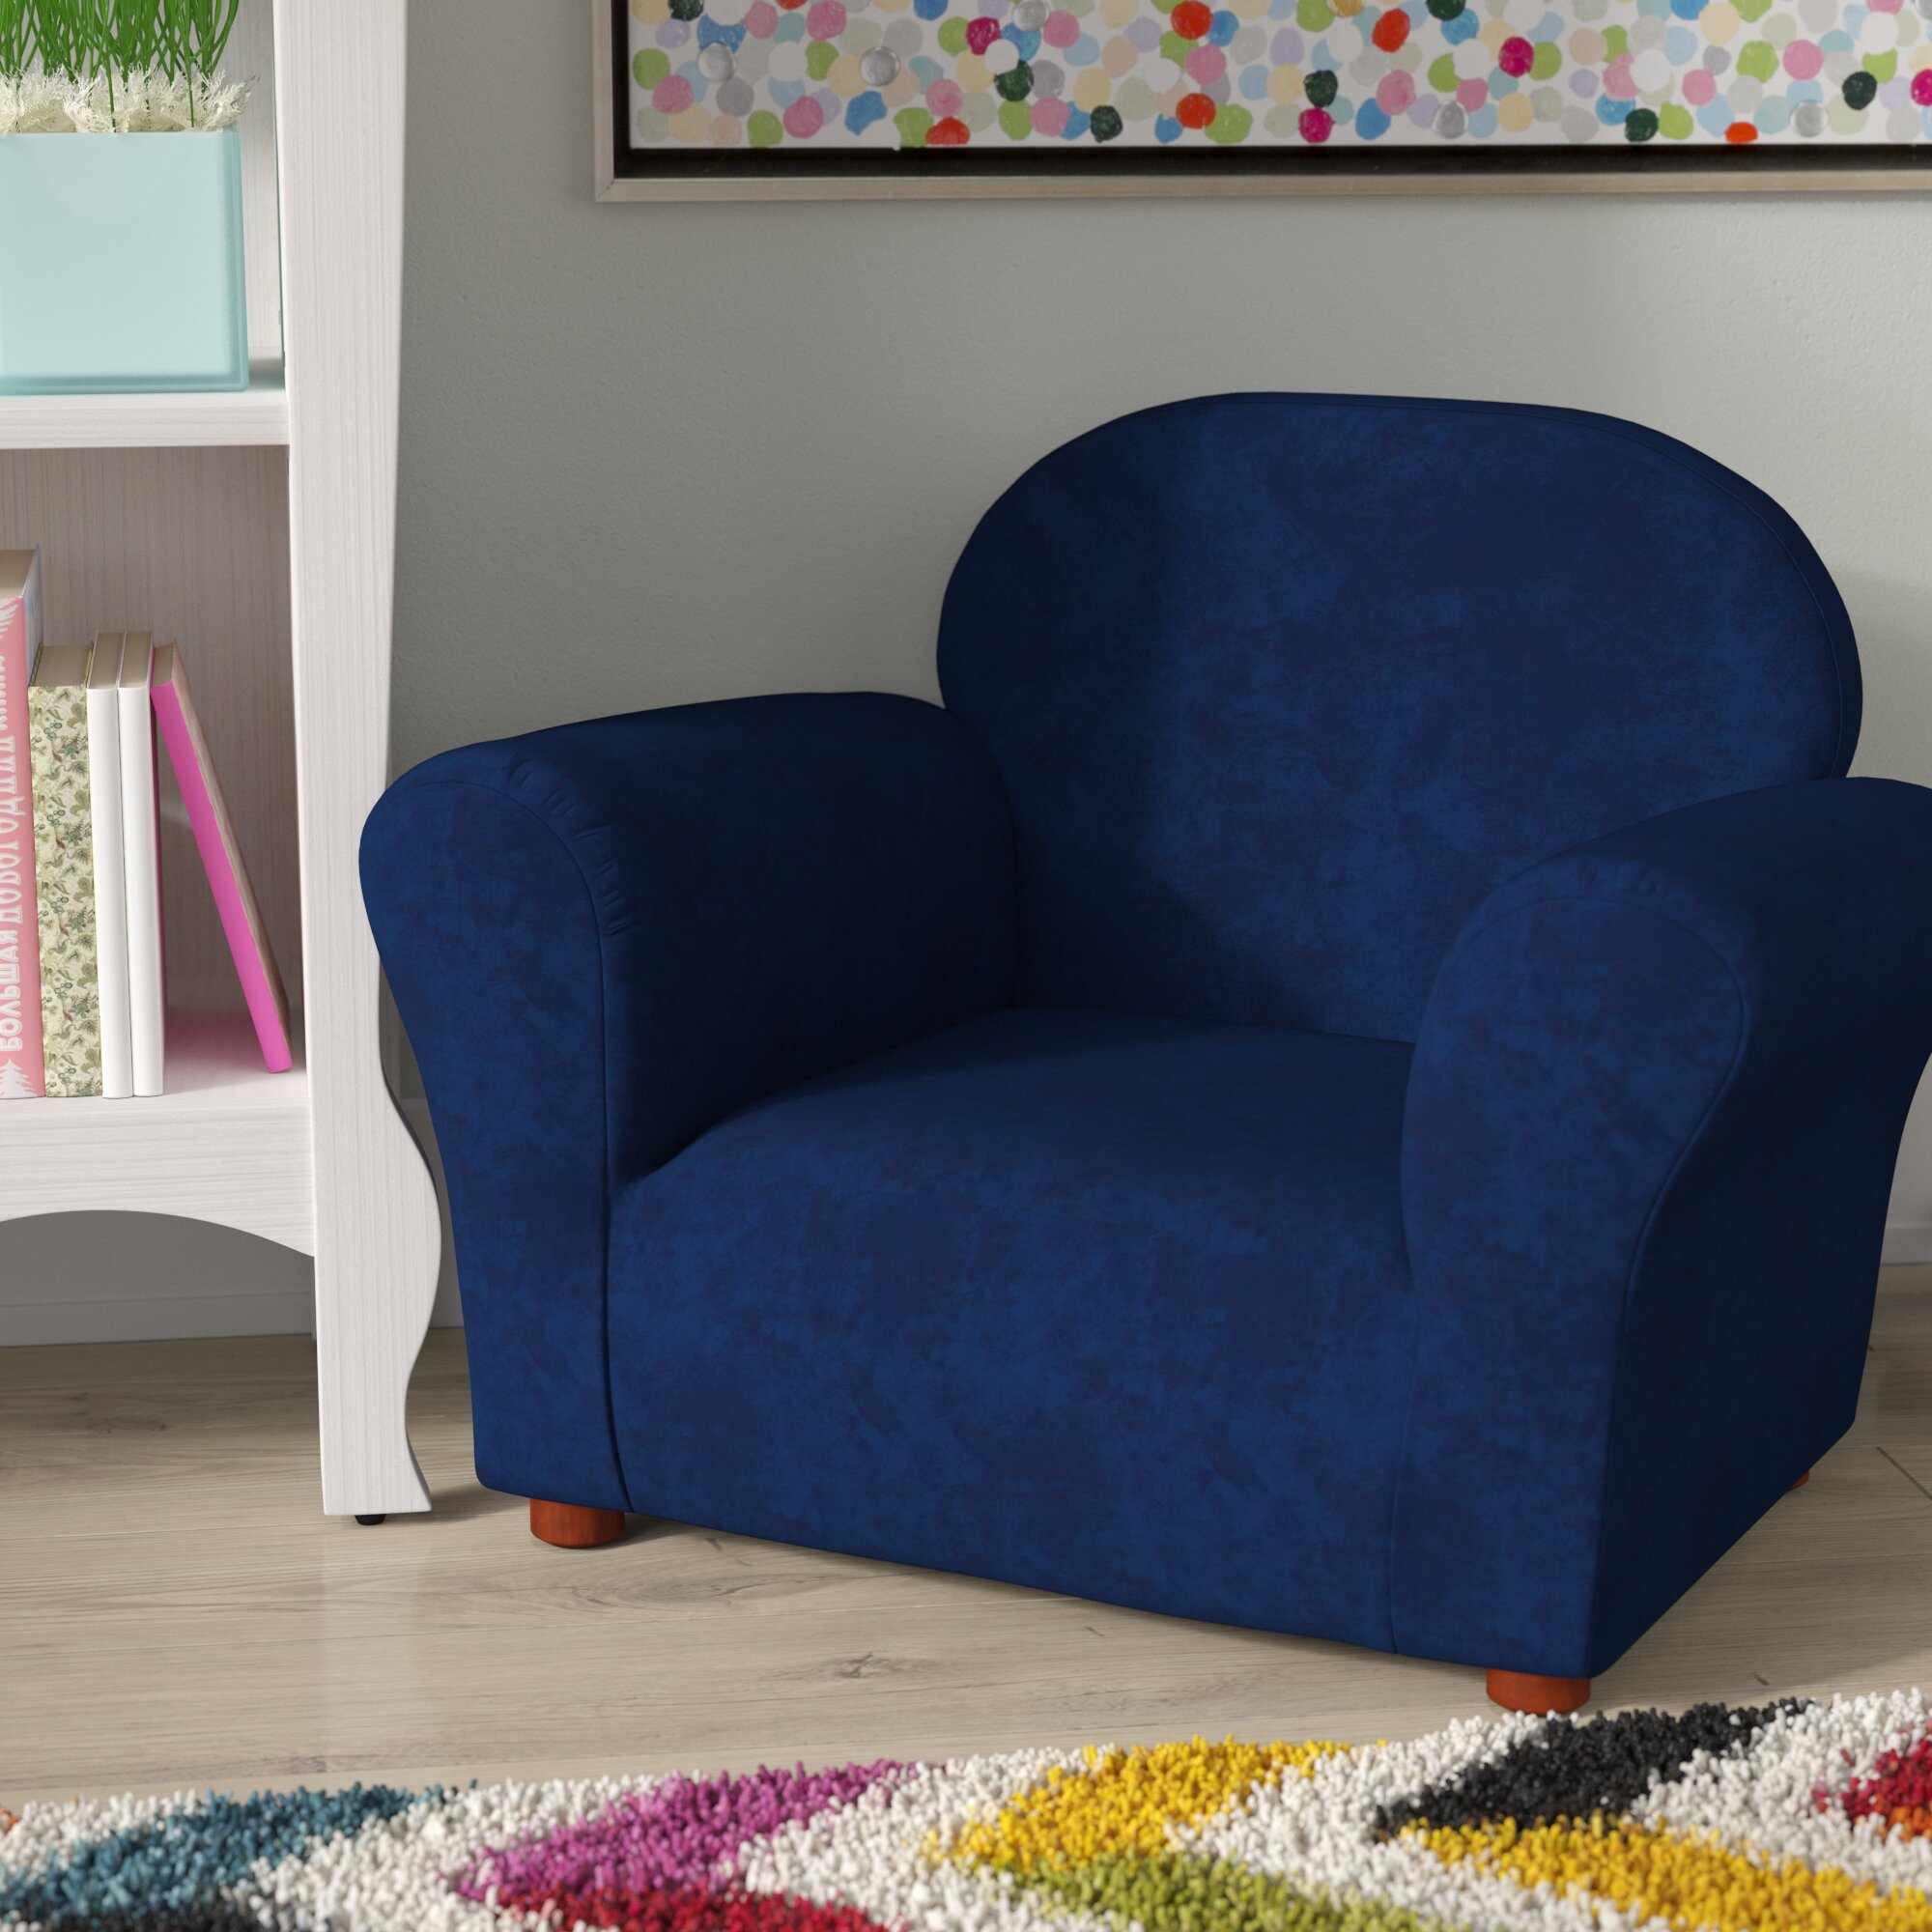 Stupendous Jovanni Personalized Kids Chair Creativecarmelina Interior Chair Design Creativecarmelinacom